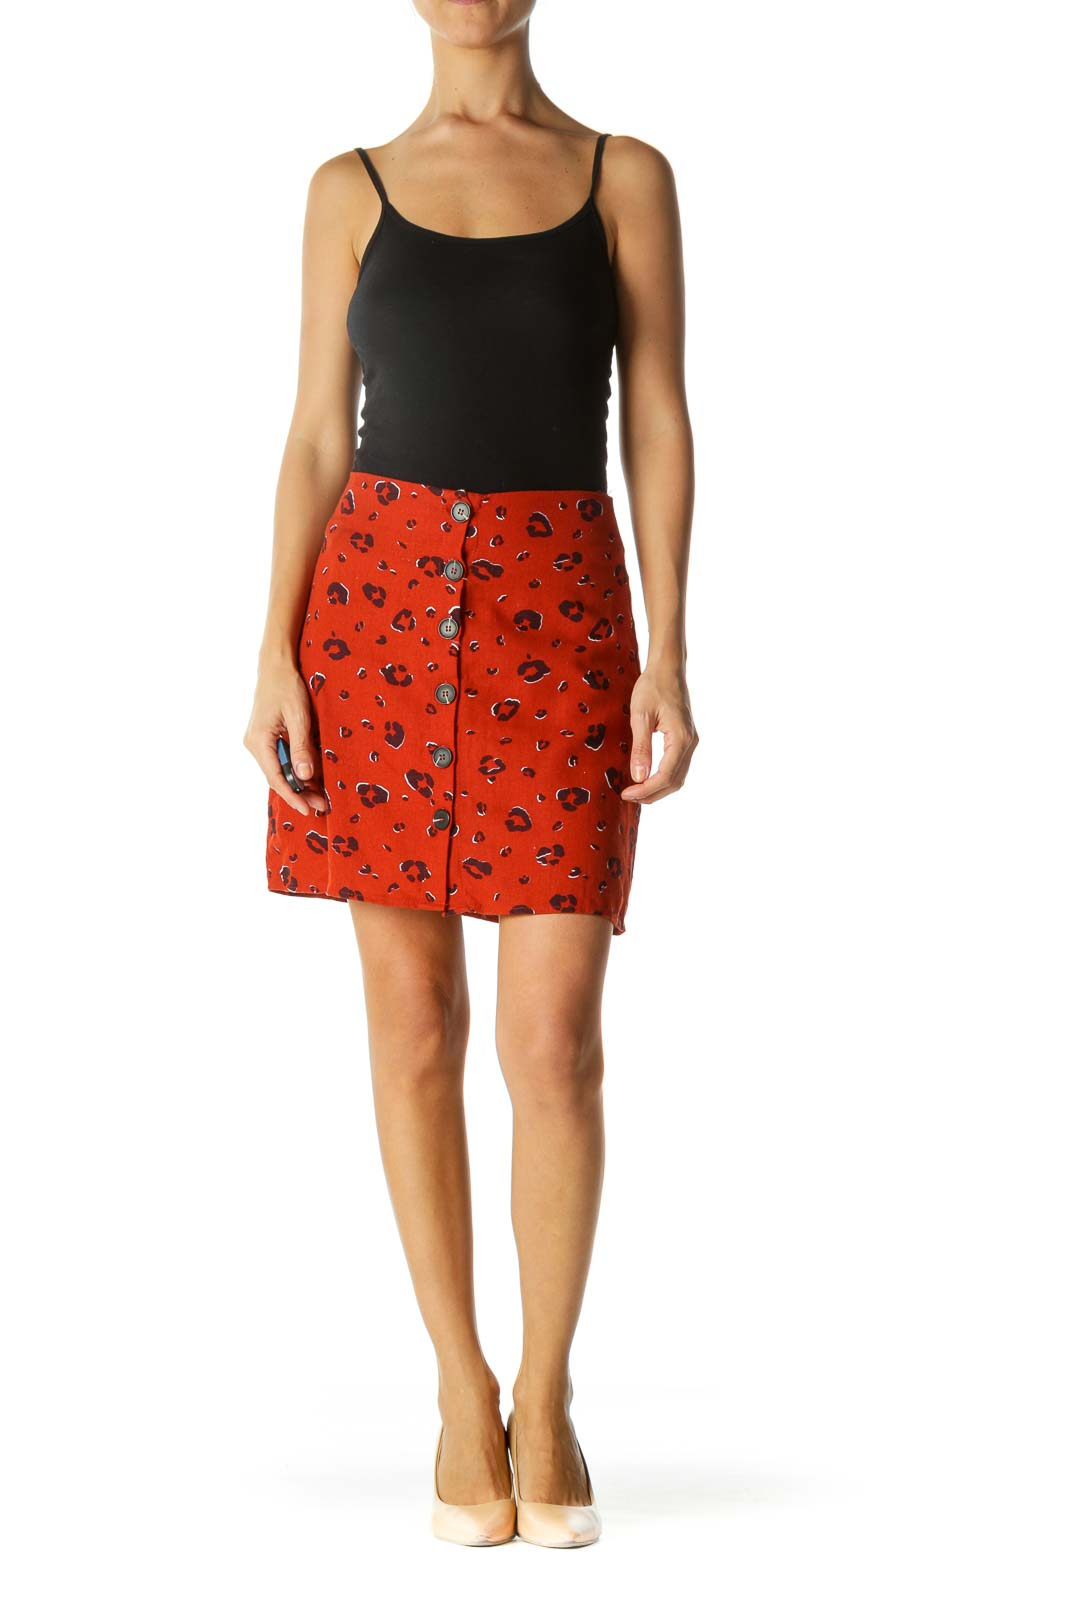 Brick Orange Black Animal Print Buttoned Thin A-Line Skirt